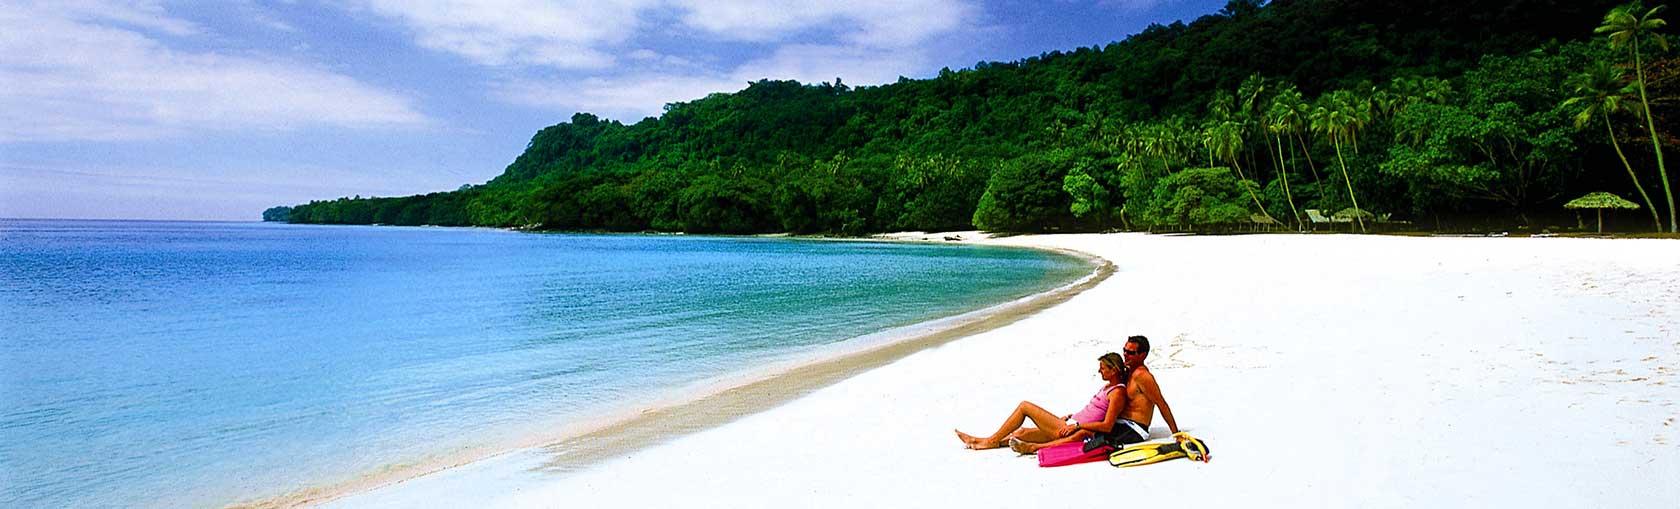 Vanuatu Holiday Packages Vanuatu Holidays Resorts Hotels